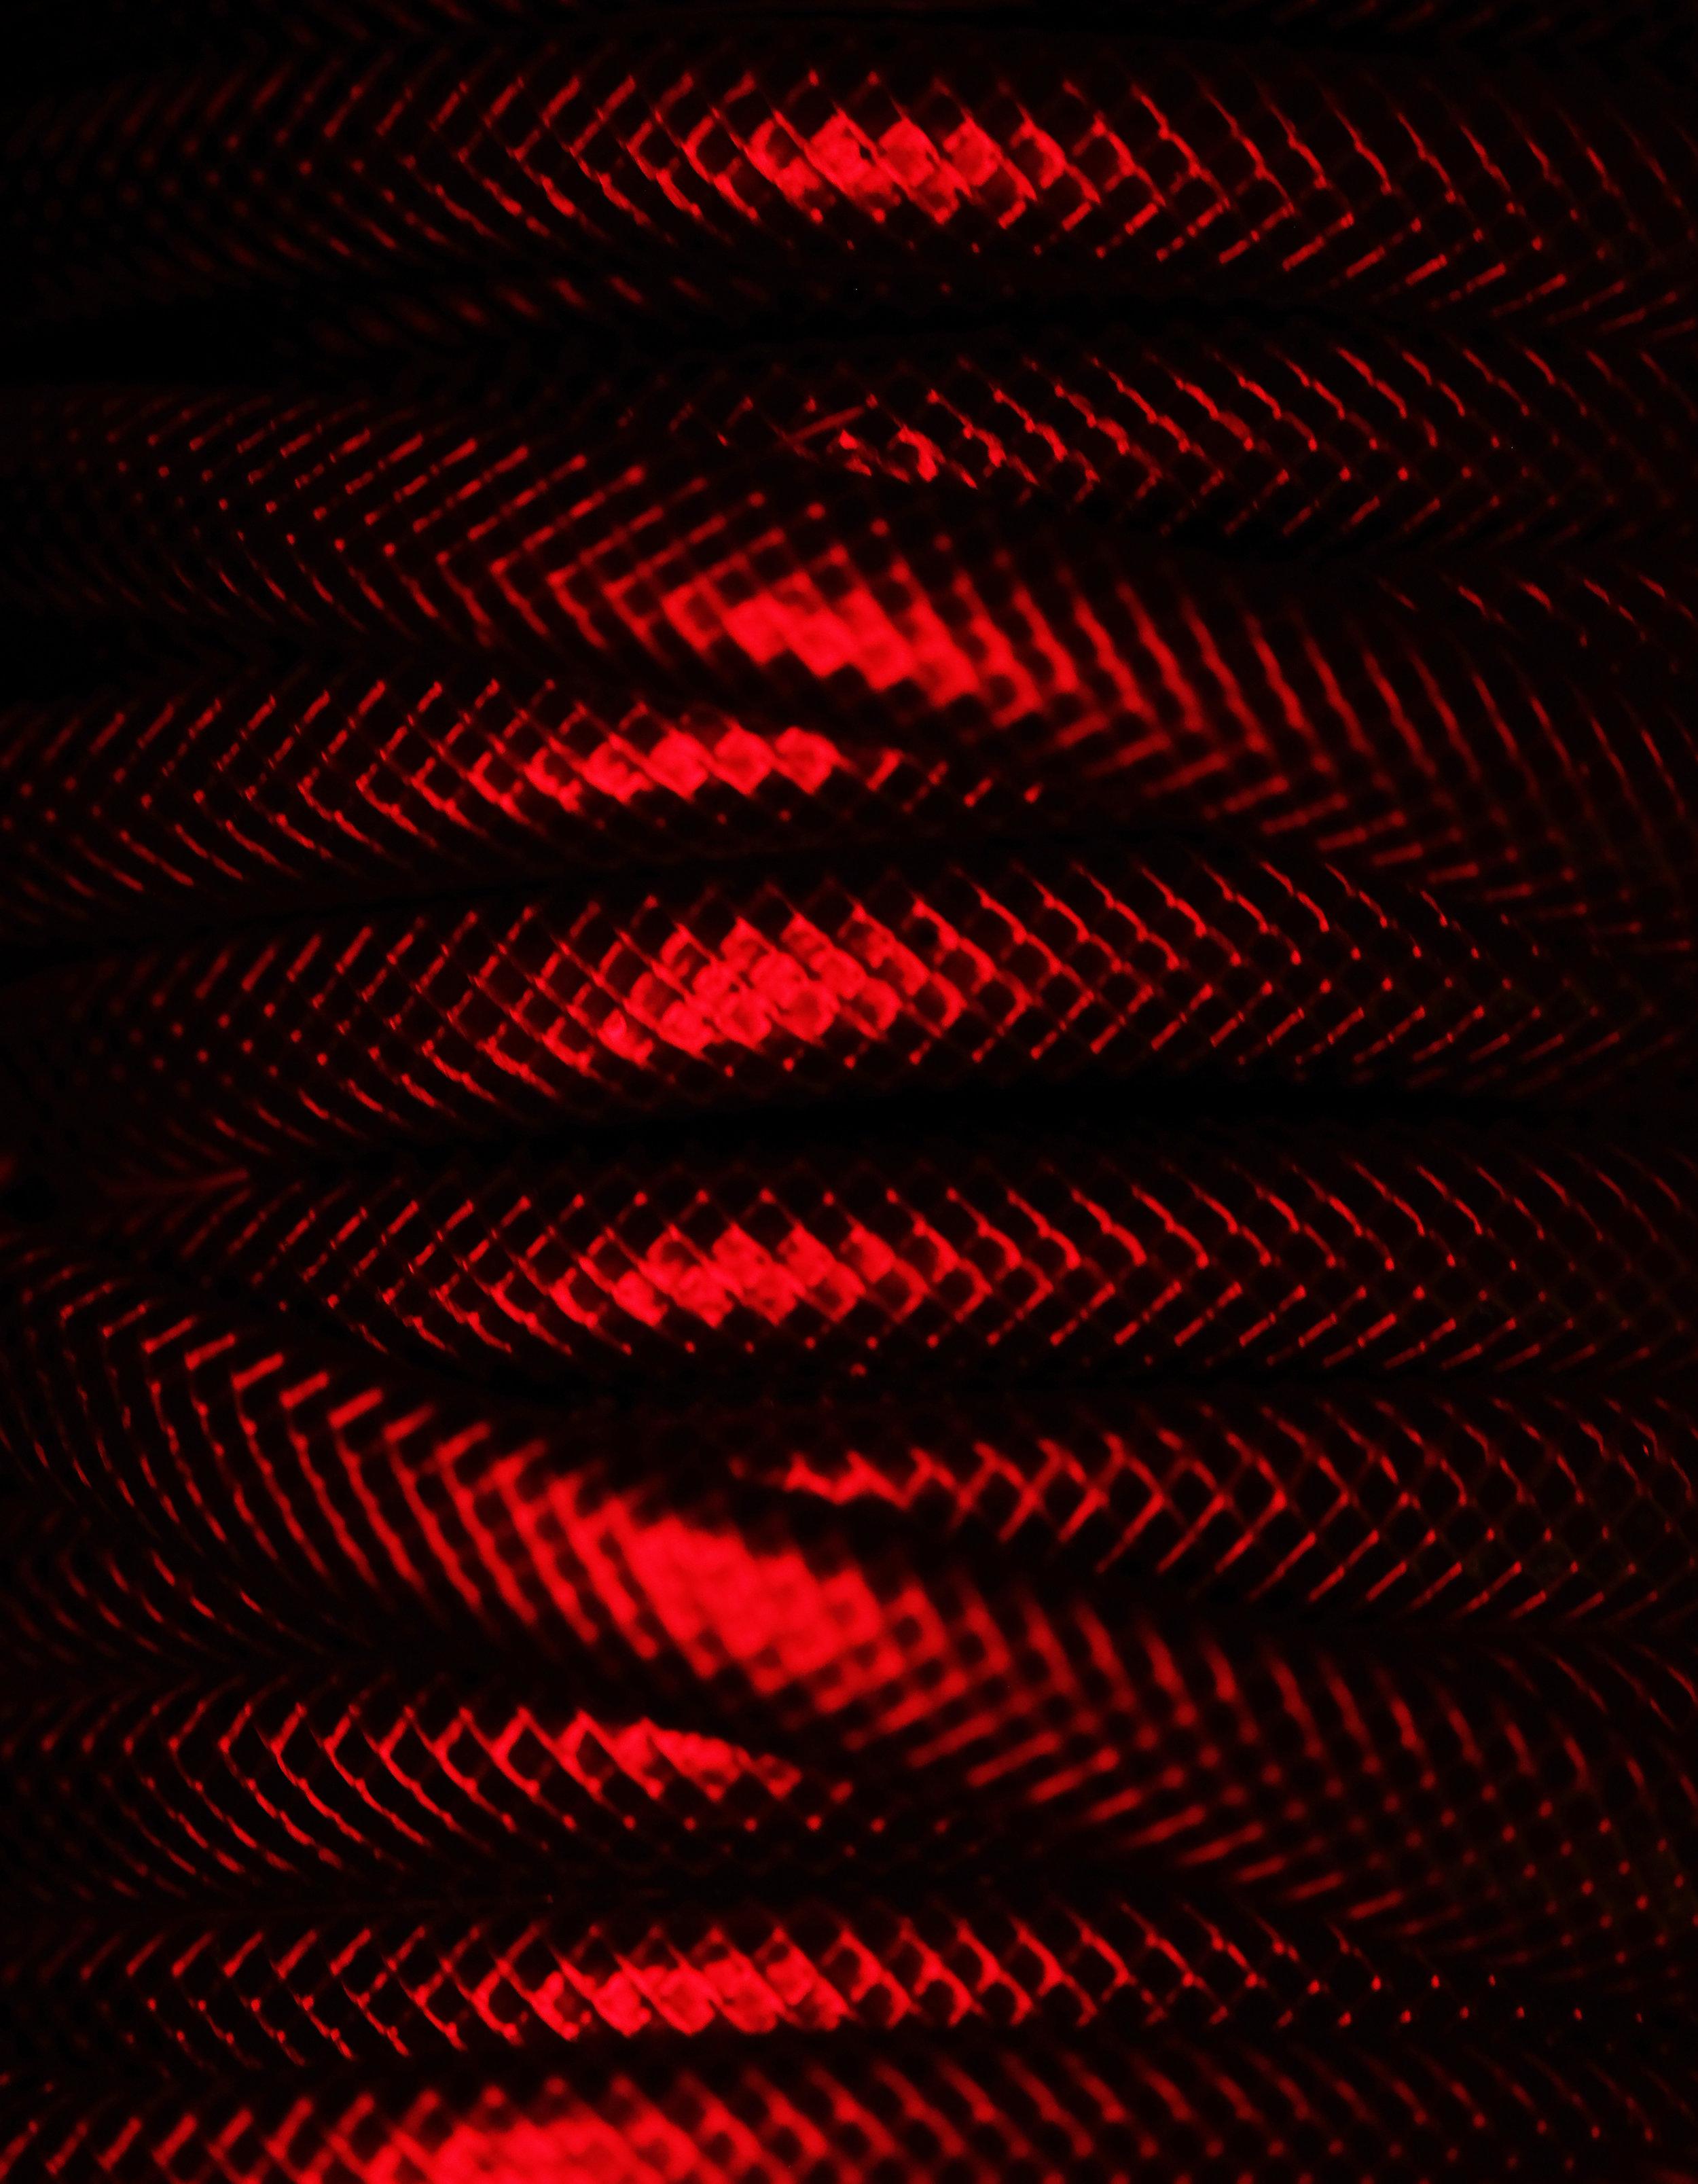 hose_pipes_red.jpg